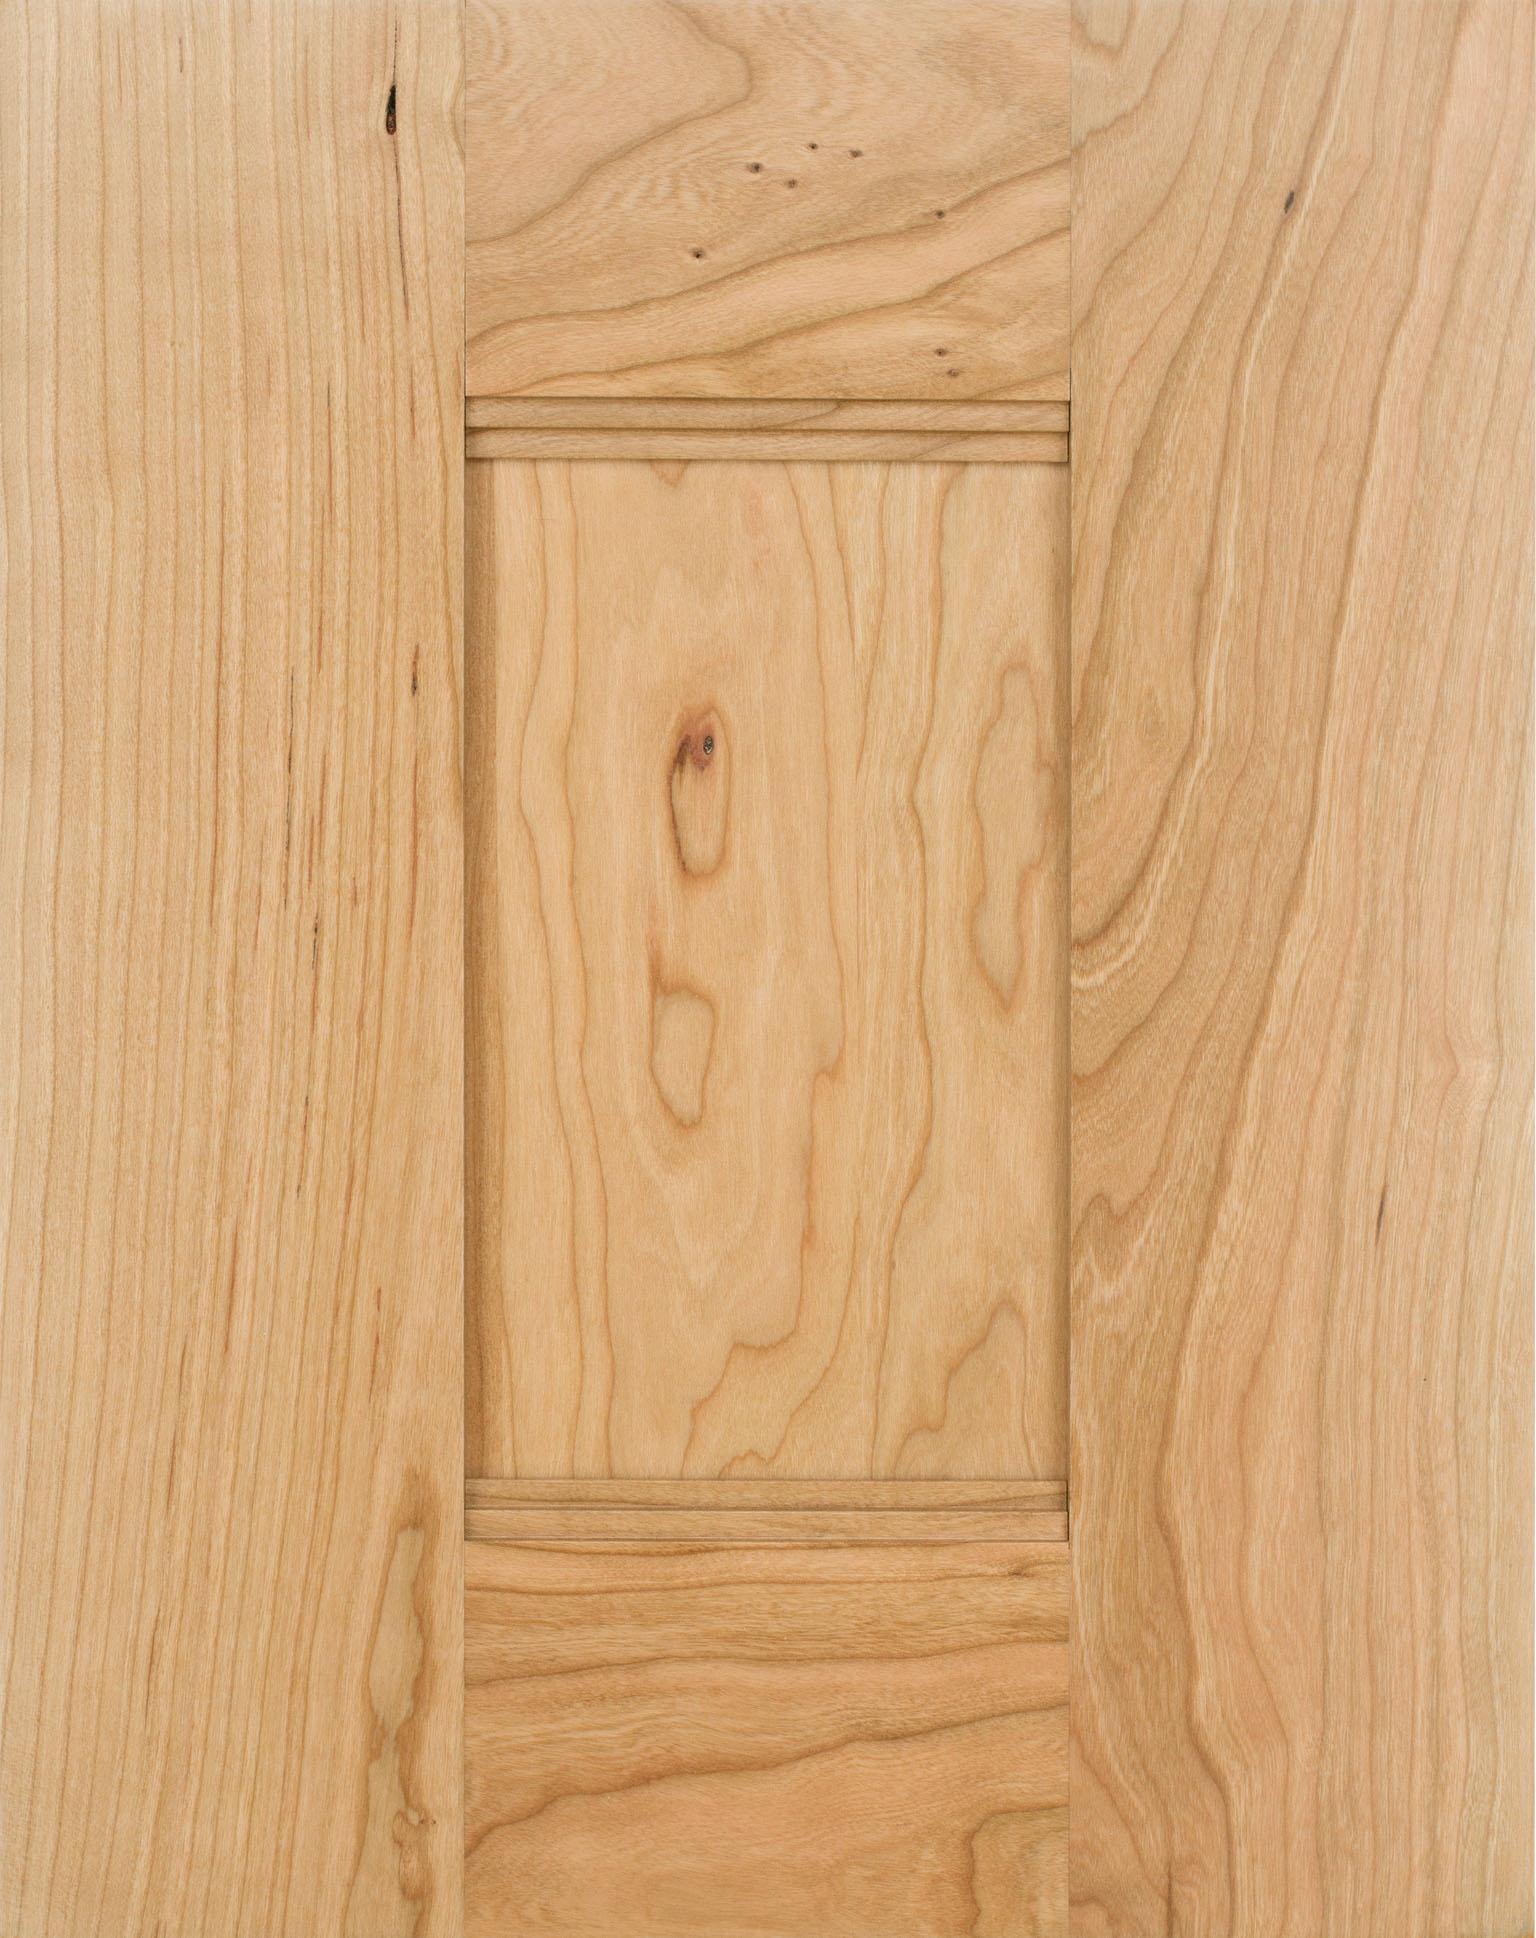 Taos 3.5 Cabinet